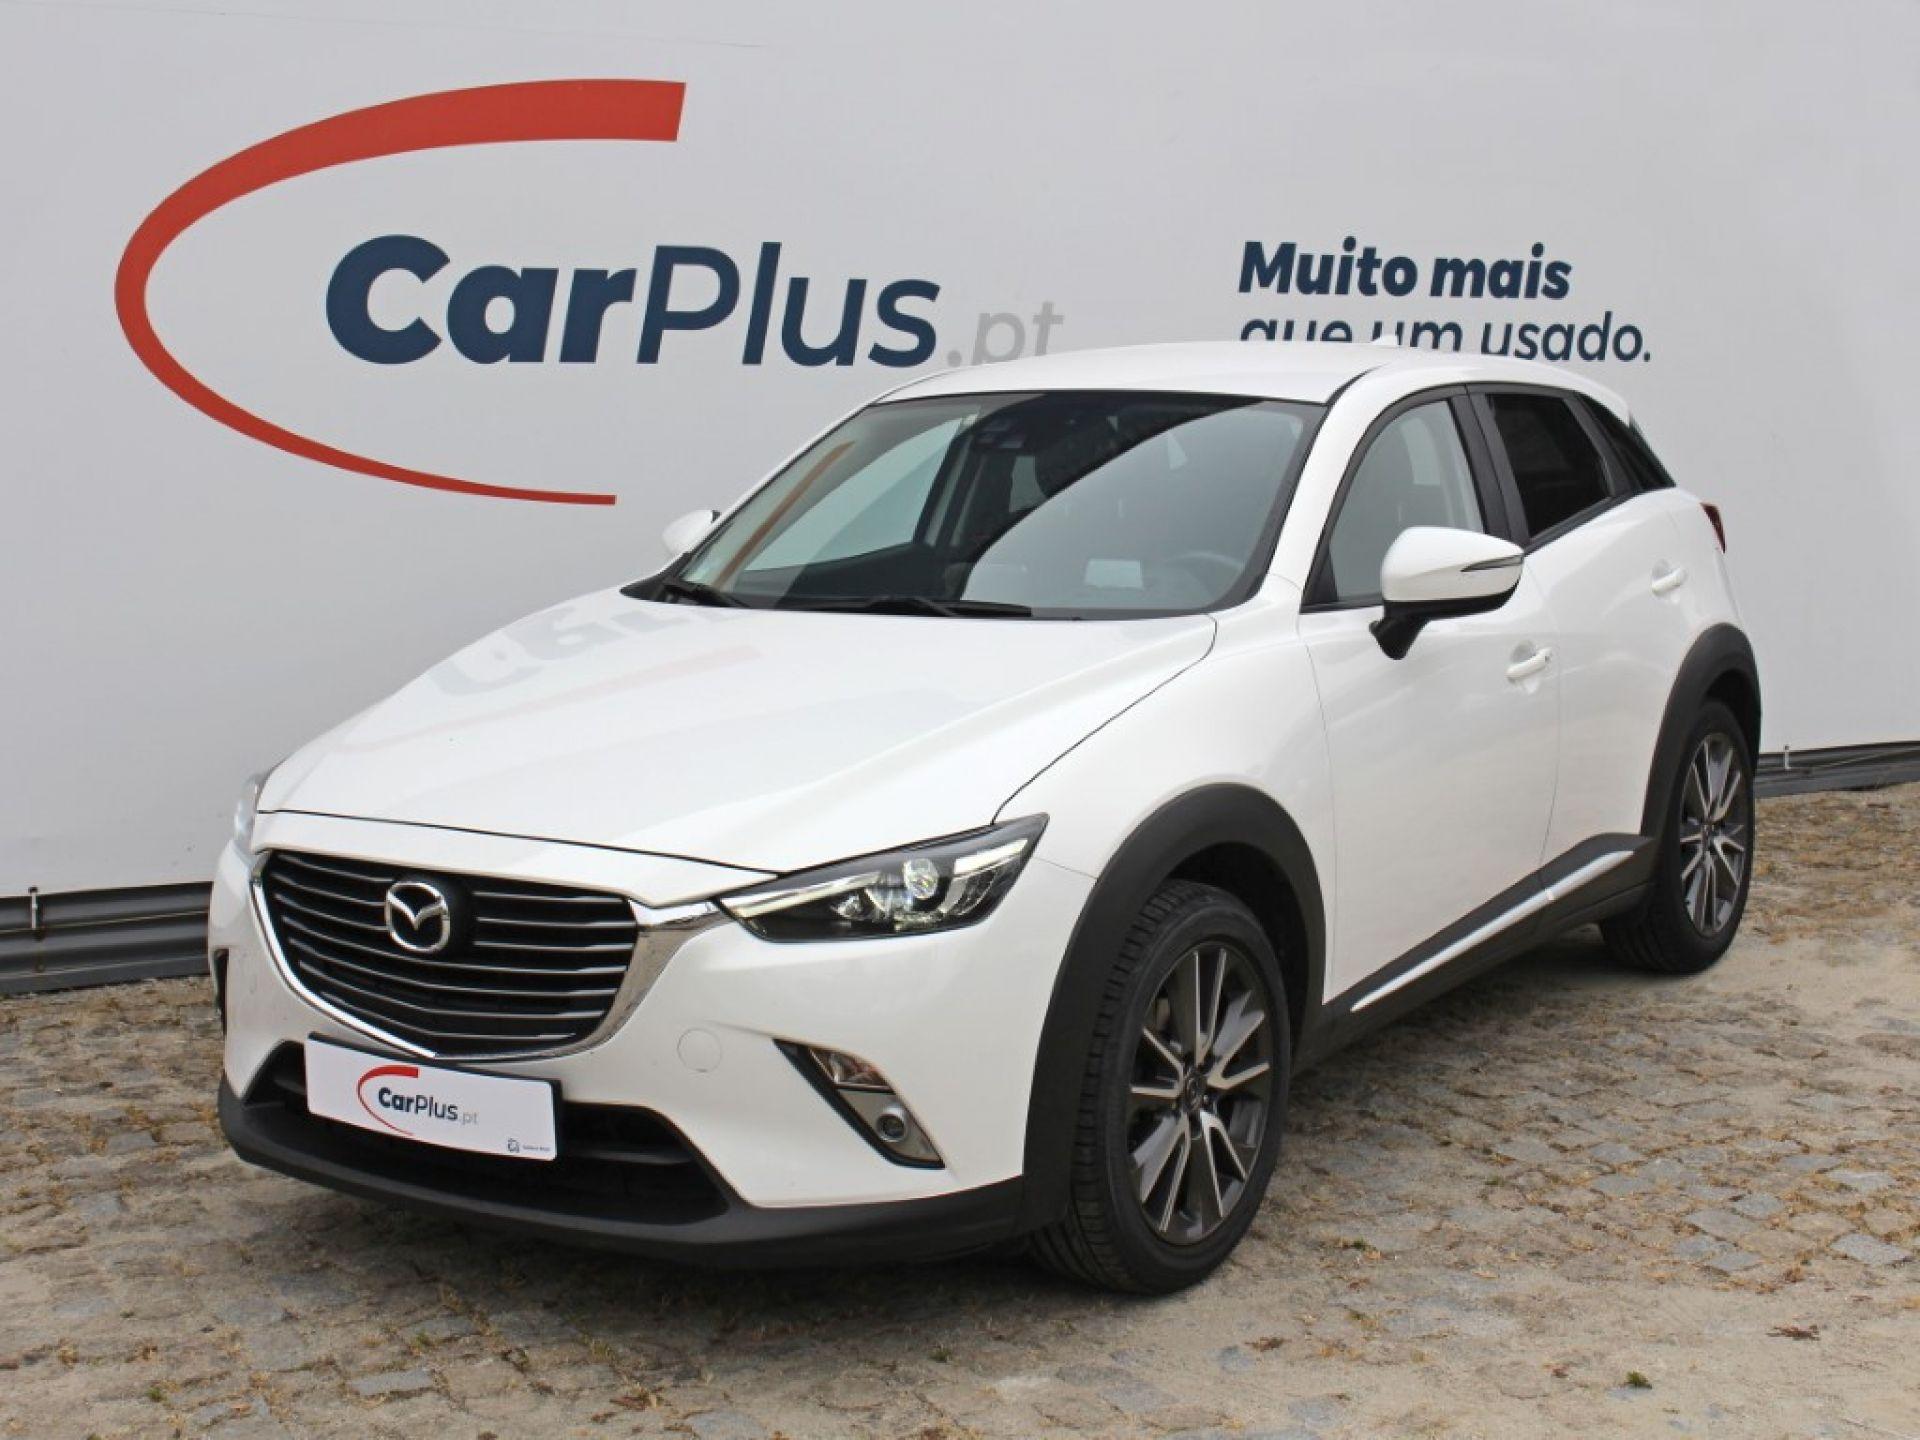 Mazda CX-3 1.5-D 105cv 4X2 Special Edition Navi segunda mão Porto